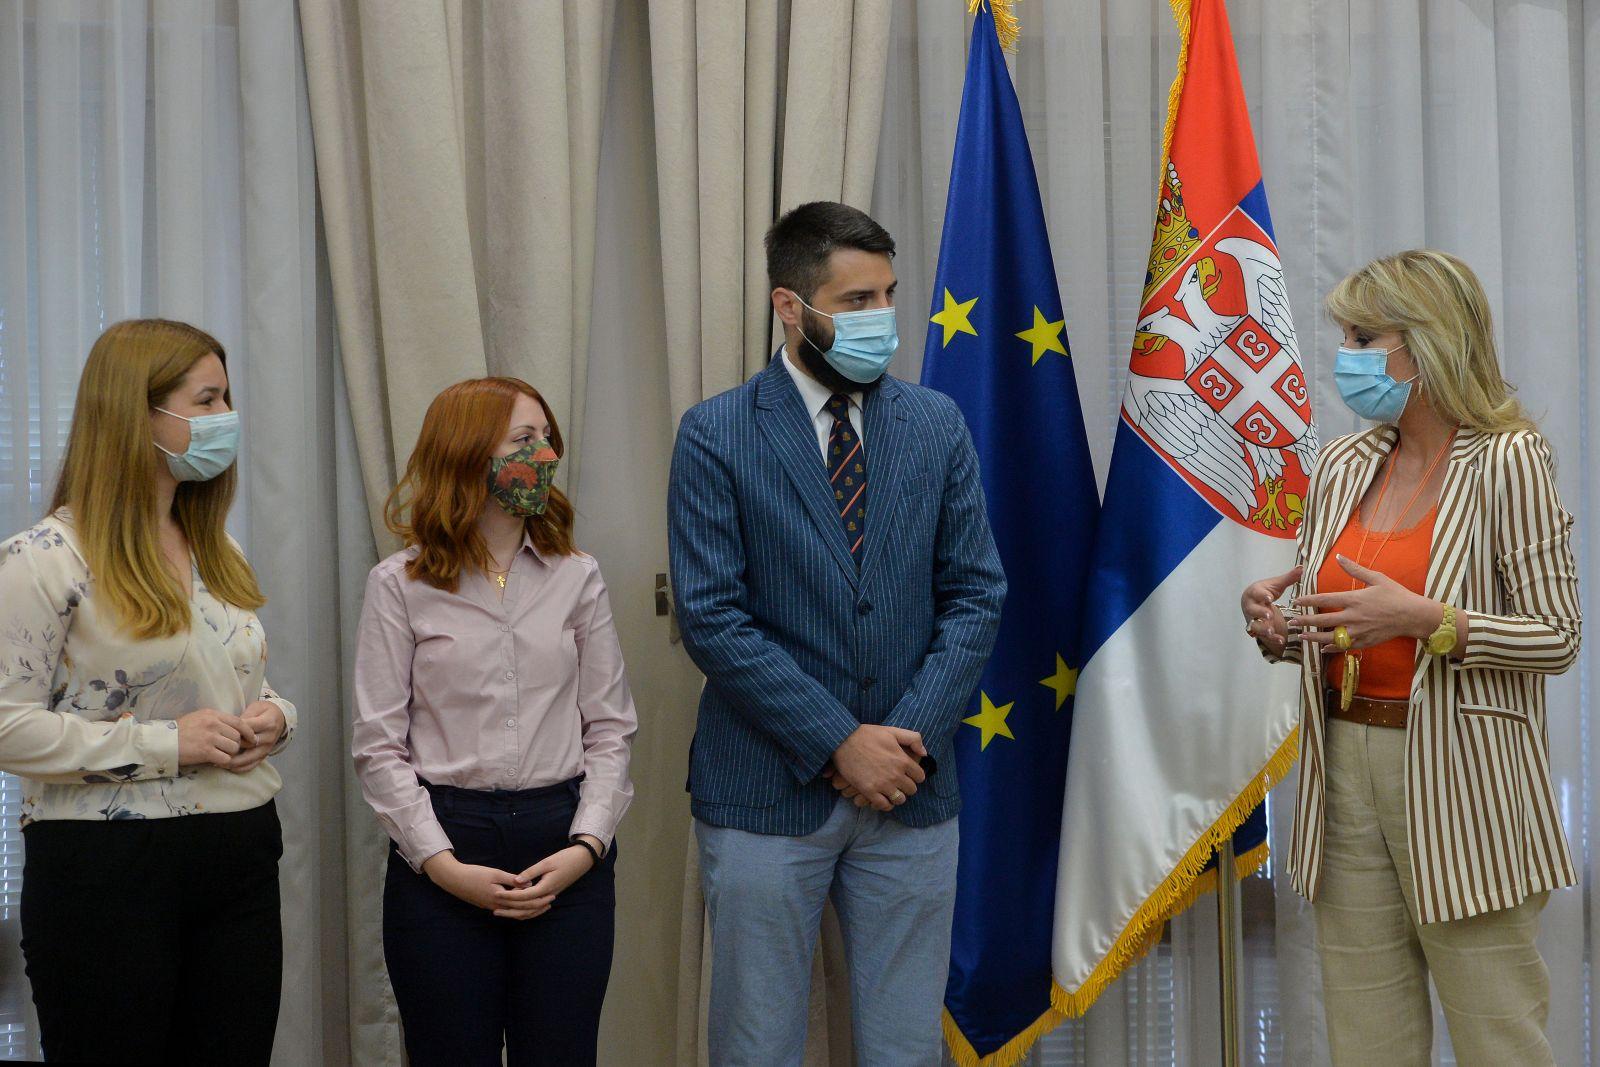 J. Joksimović awards certificates to students for best papers